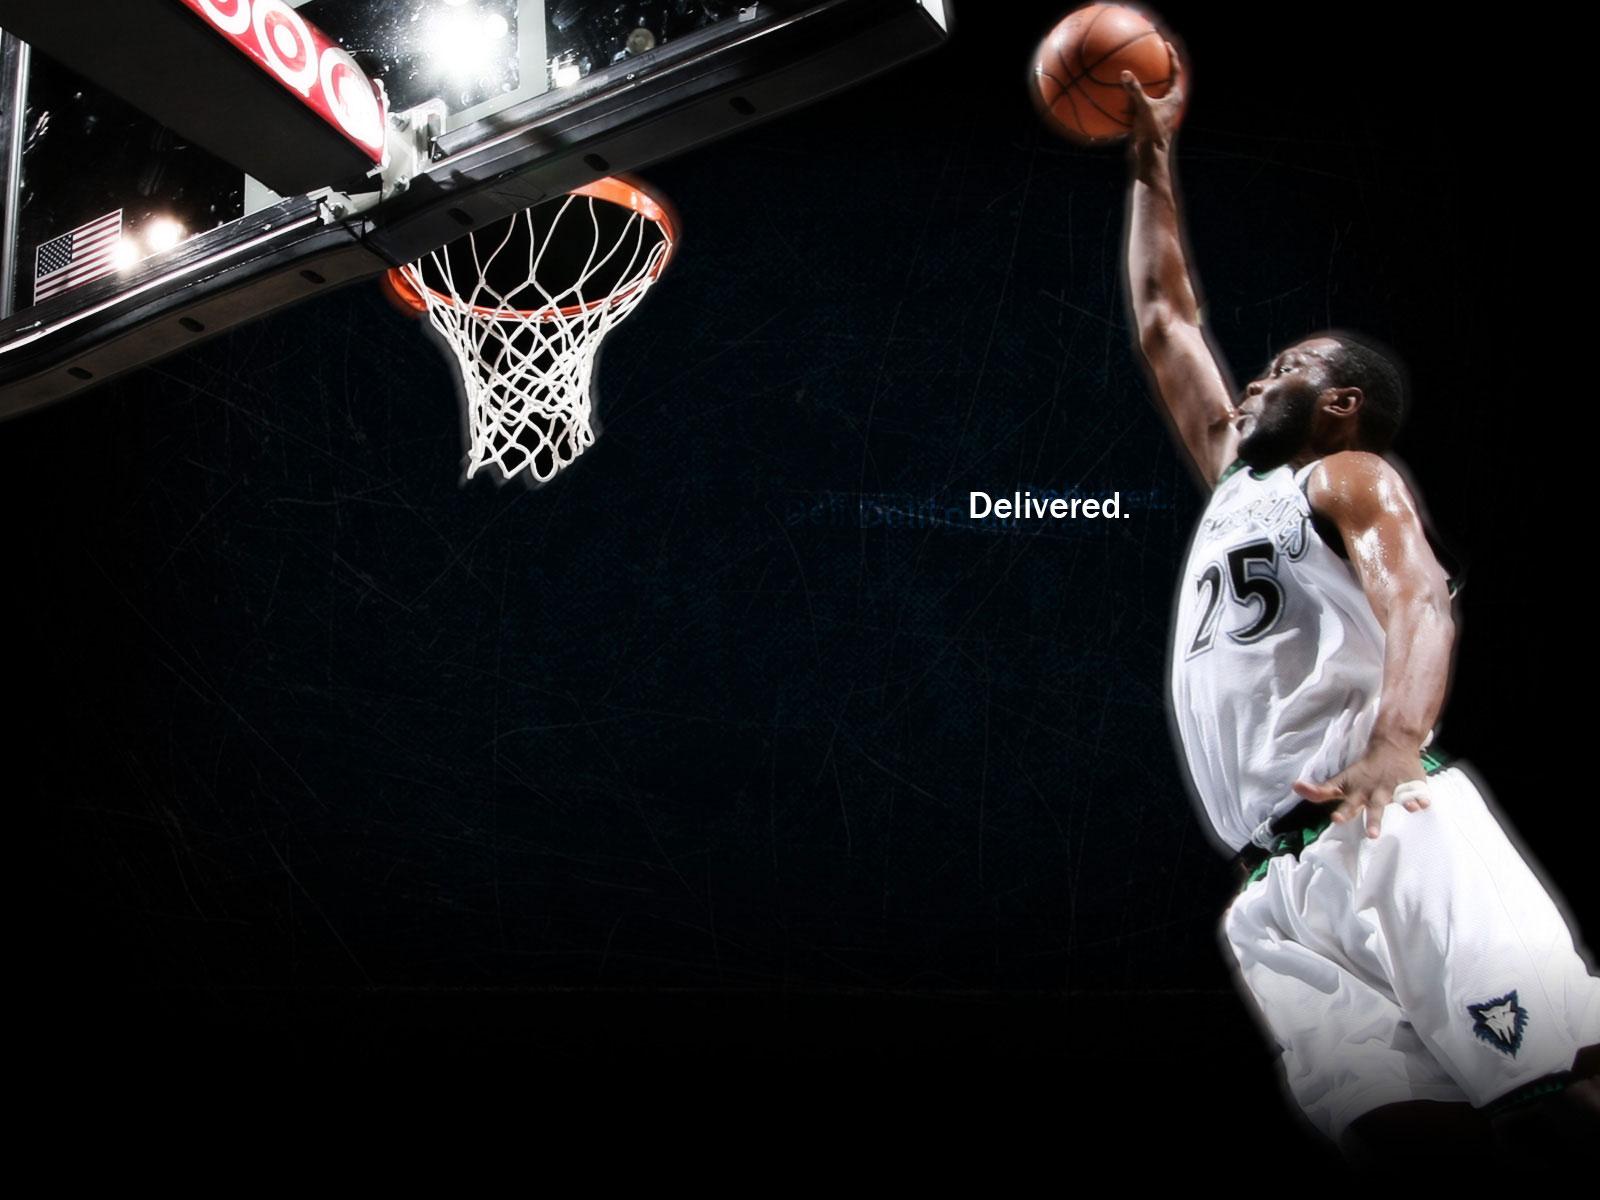 Al Jefferson Dunk Wallpaper Basketball Wallpapers At